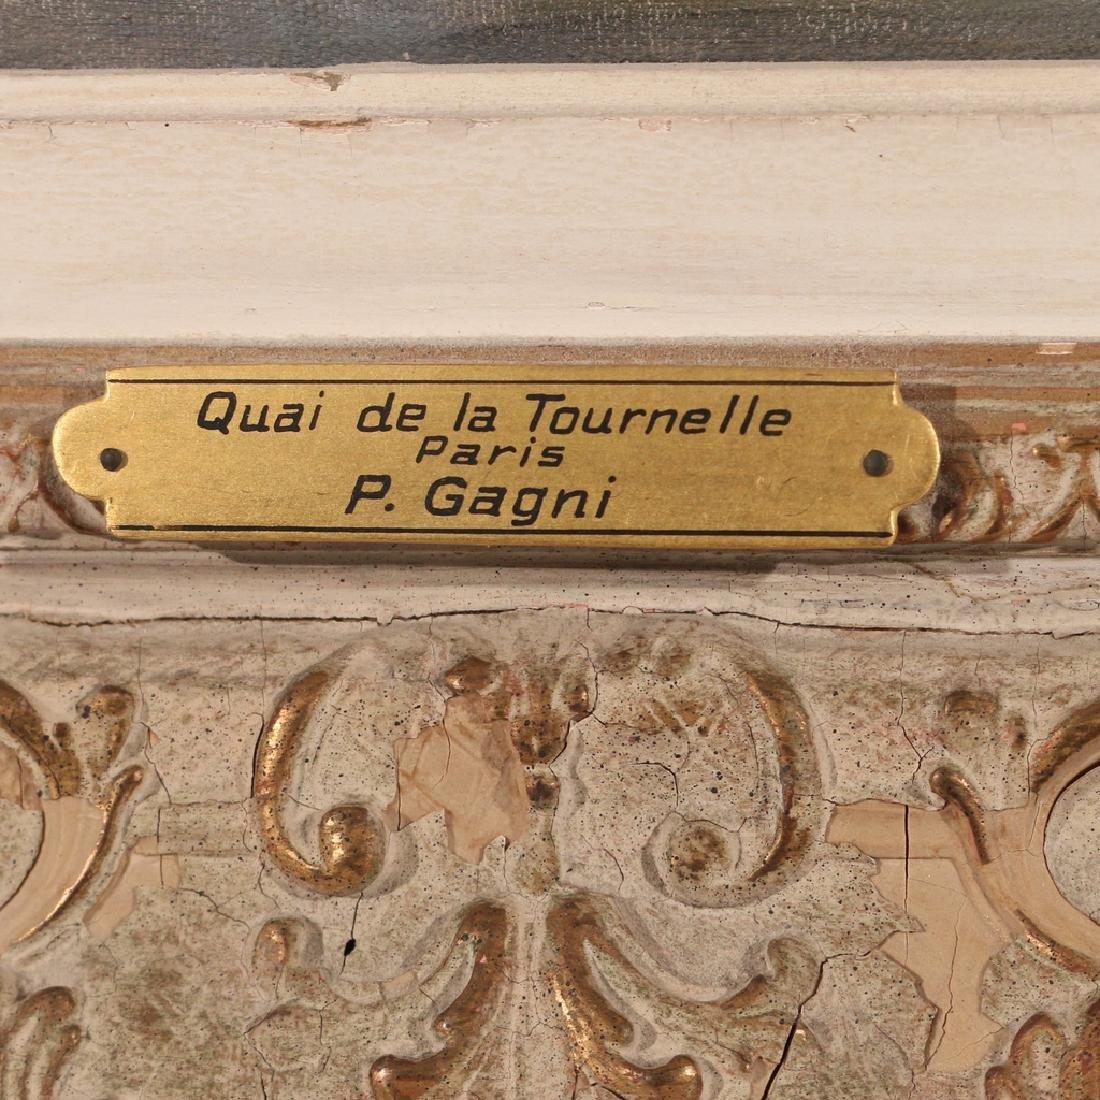 PAUL GAGNI (French, 1893-1962), - 10